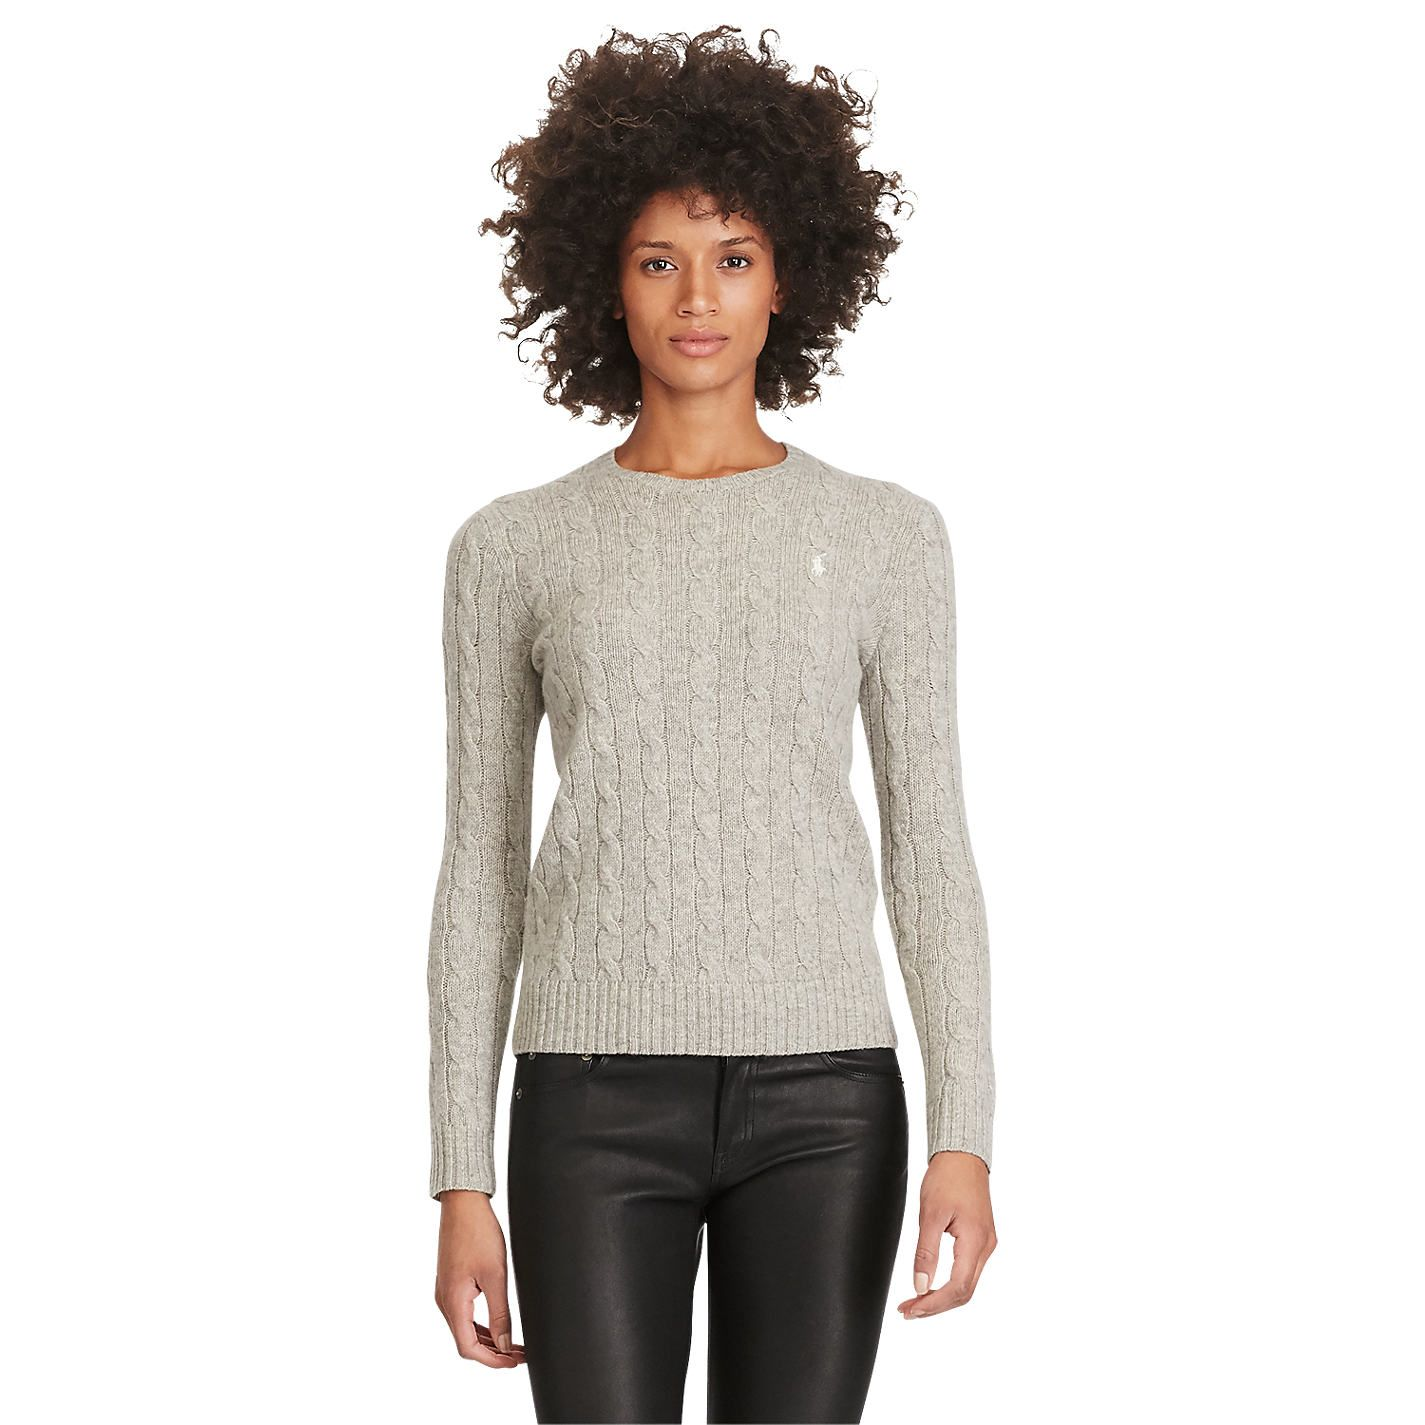 8495e2ca58fcc Buy Polo Ralph Lauren Julianna Cable Knit Jumper